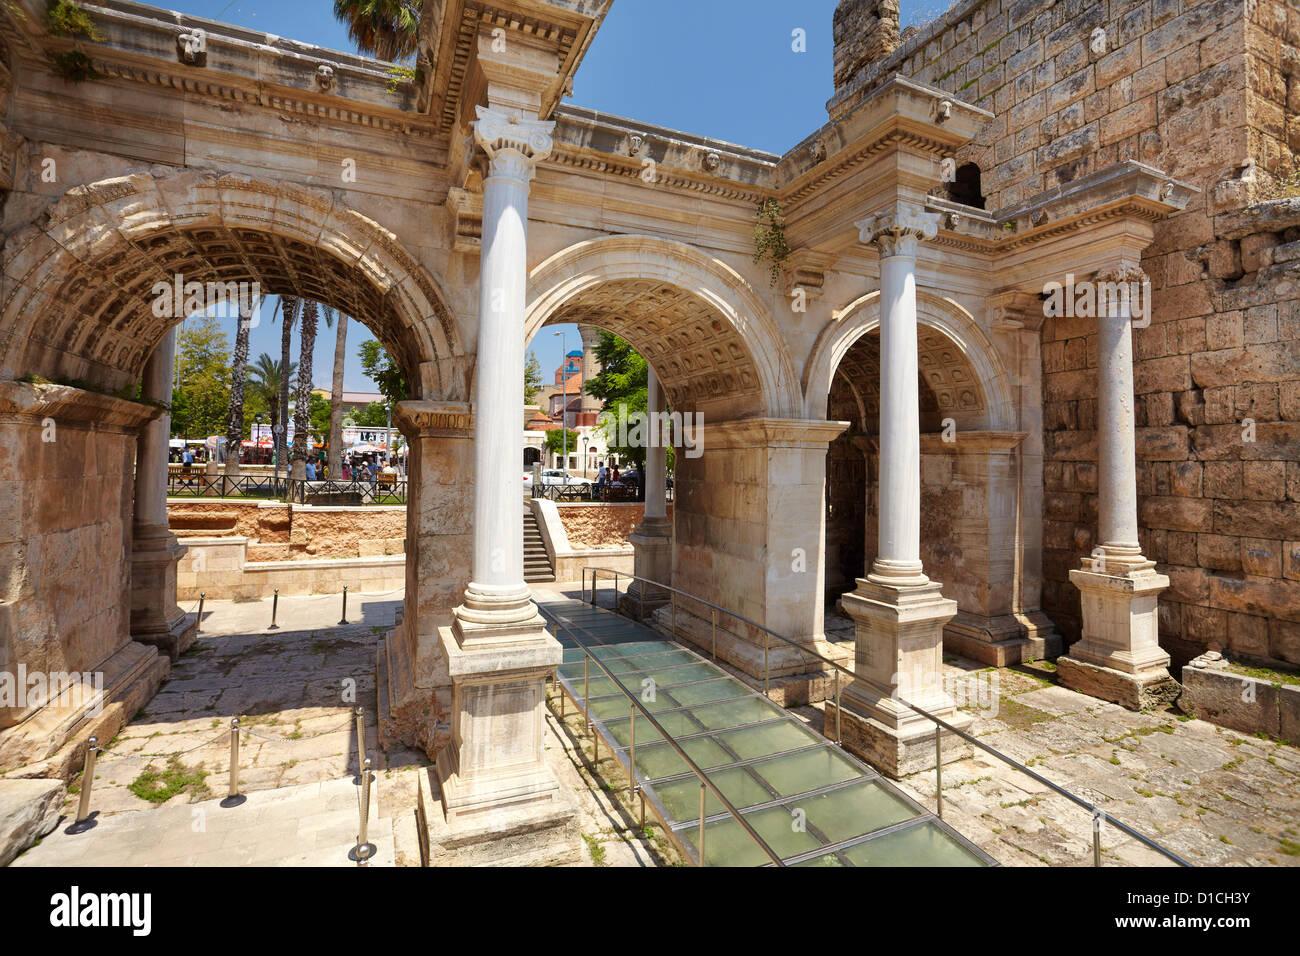 View of Hadrian's Gate Antalya Turkey - Stock Image